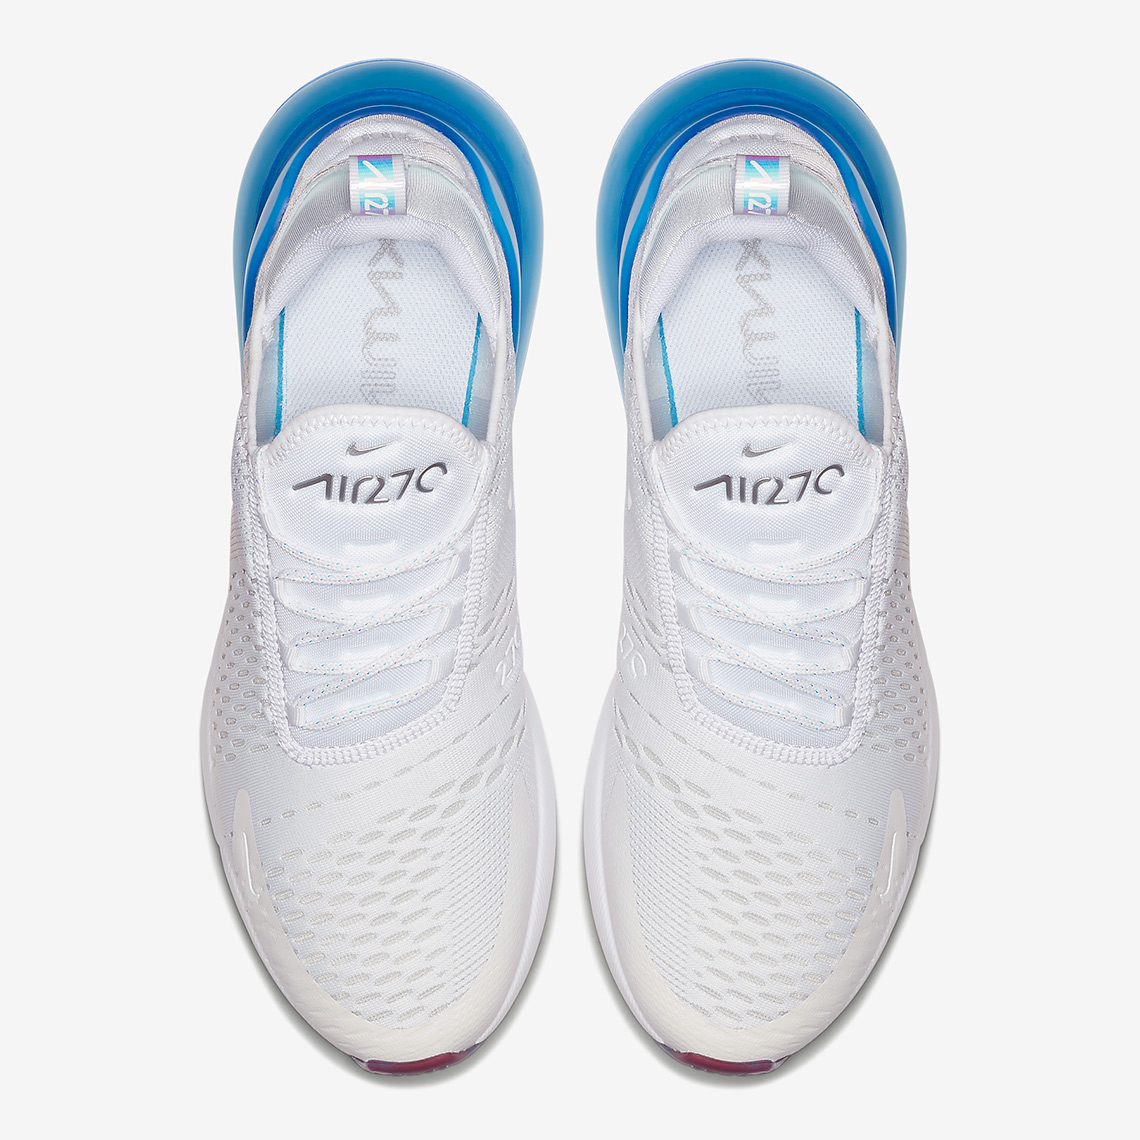 Where to buy Nike Air Max 270 Tea Berry AQ7982 100 | Hoop